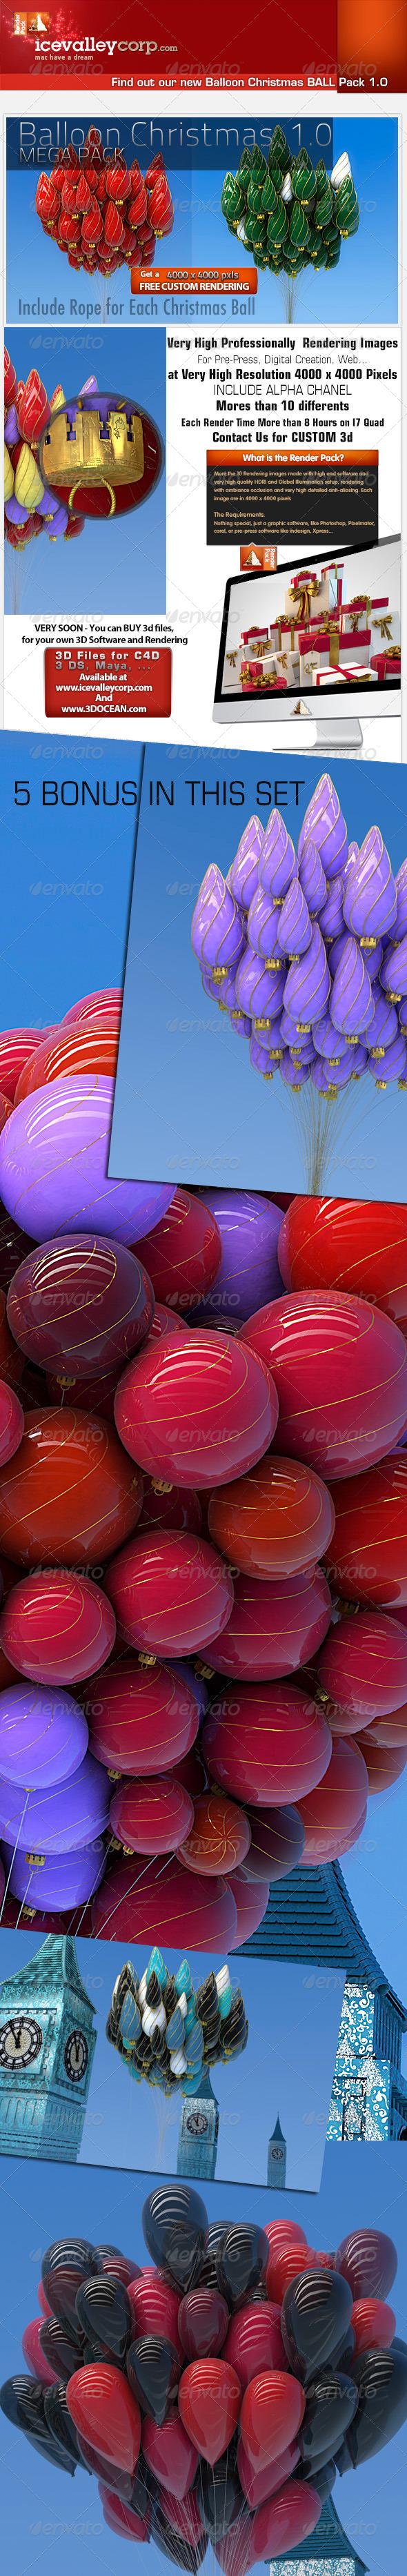 GraphicRiver Christmas Balloon Ball Decoration-Hires 6156089